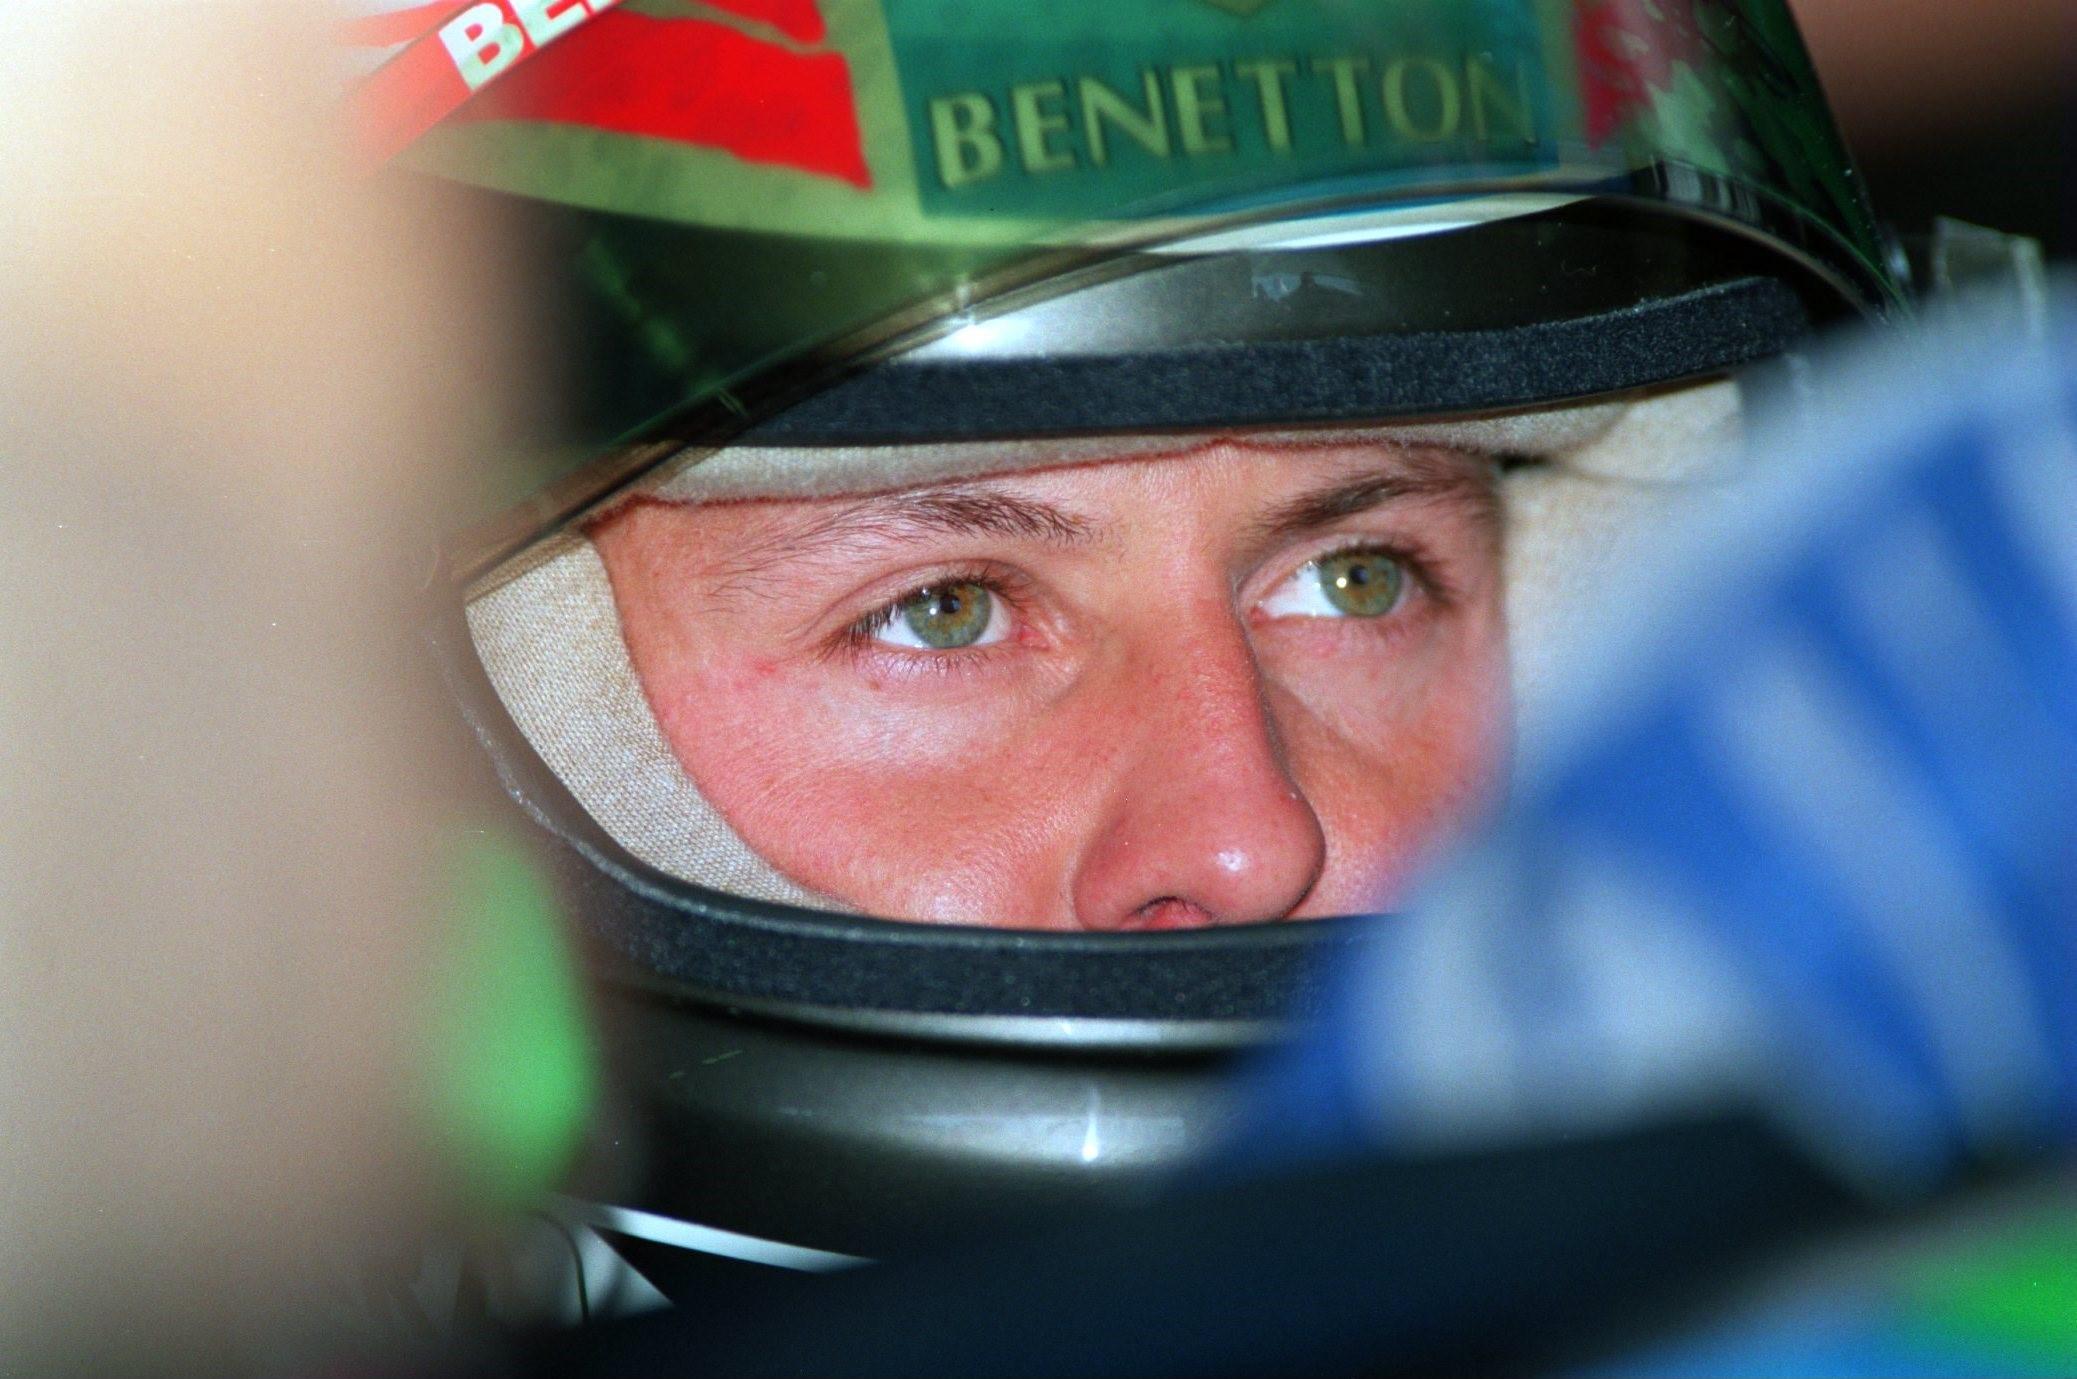 Michael Schumacher (Benetton) au Grand Prix de Grande-Bretagne 1994